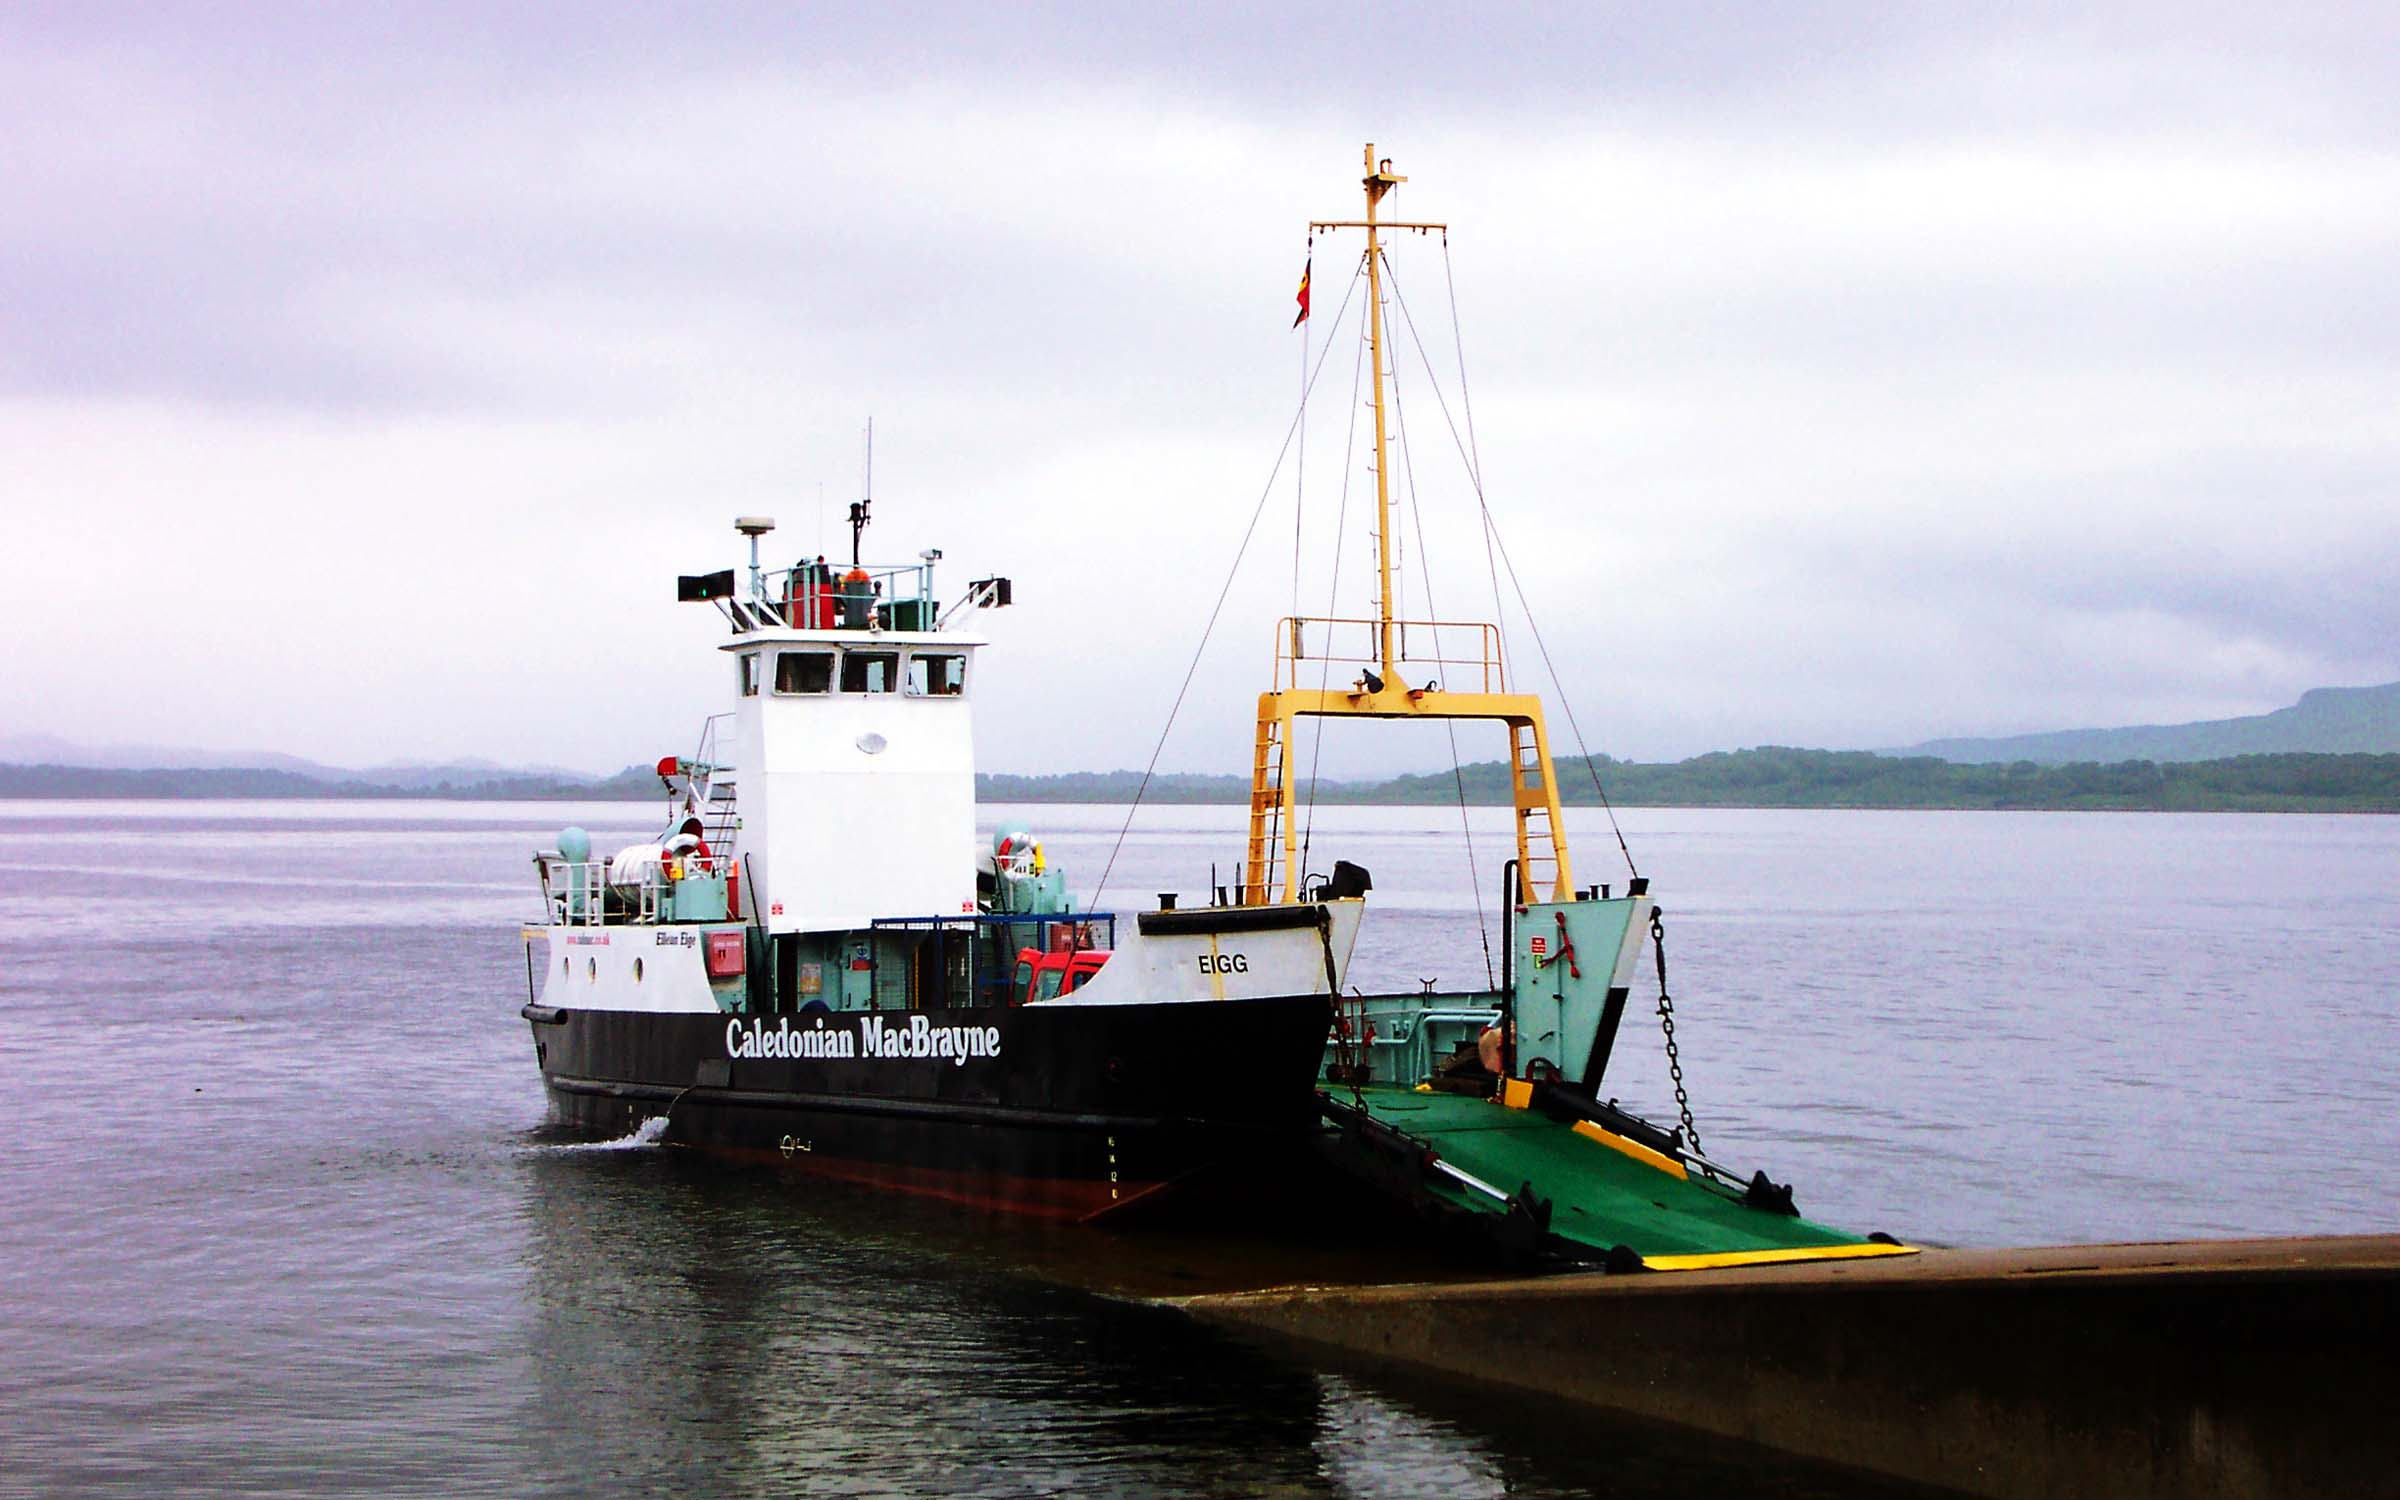 Eigg at Lismore (Ships of CalMac)